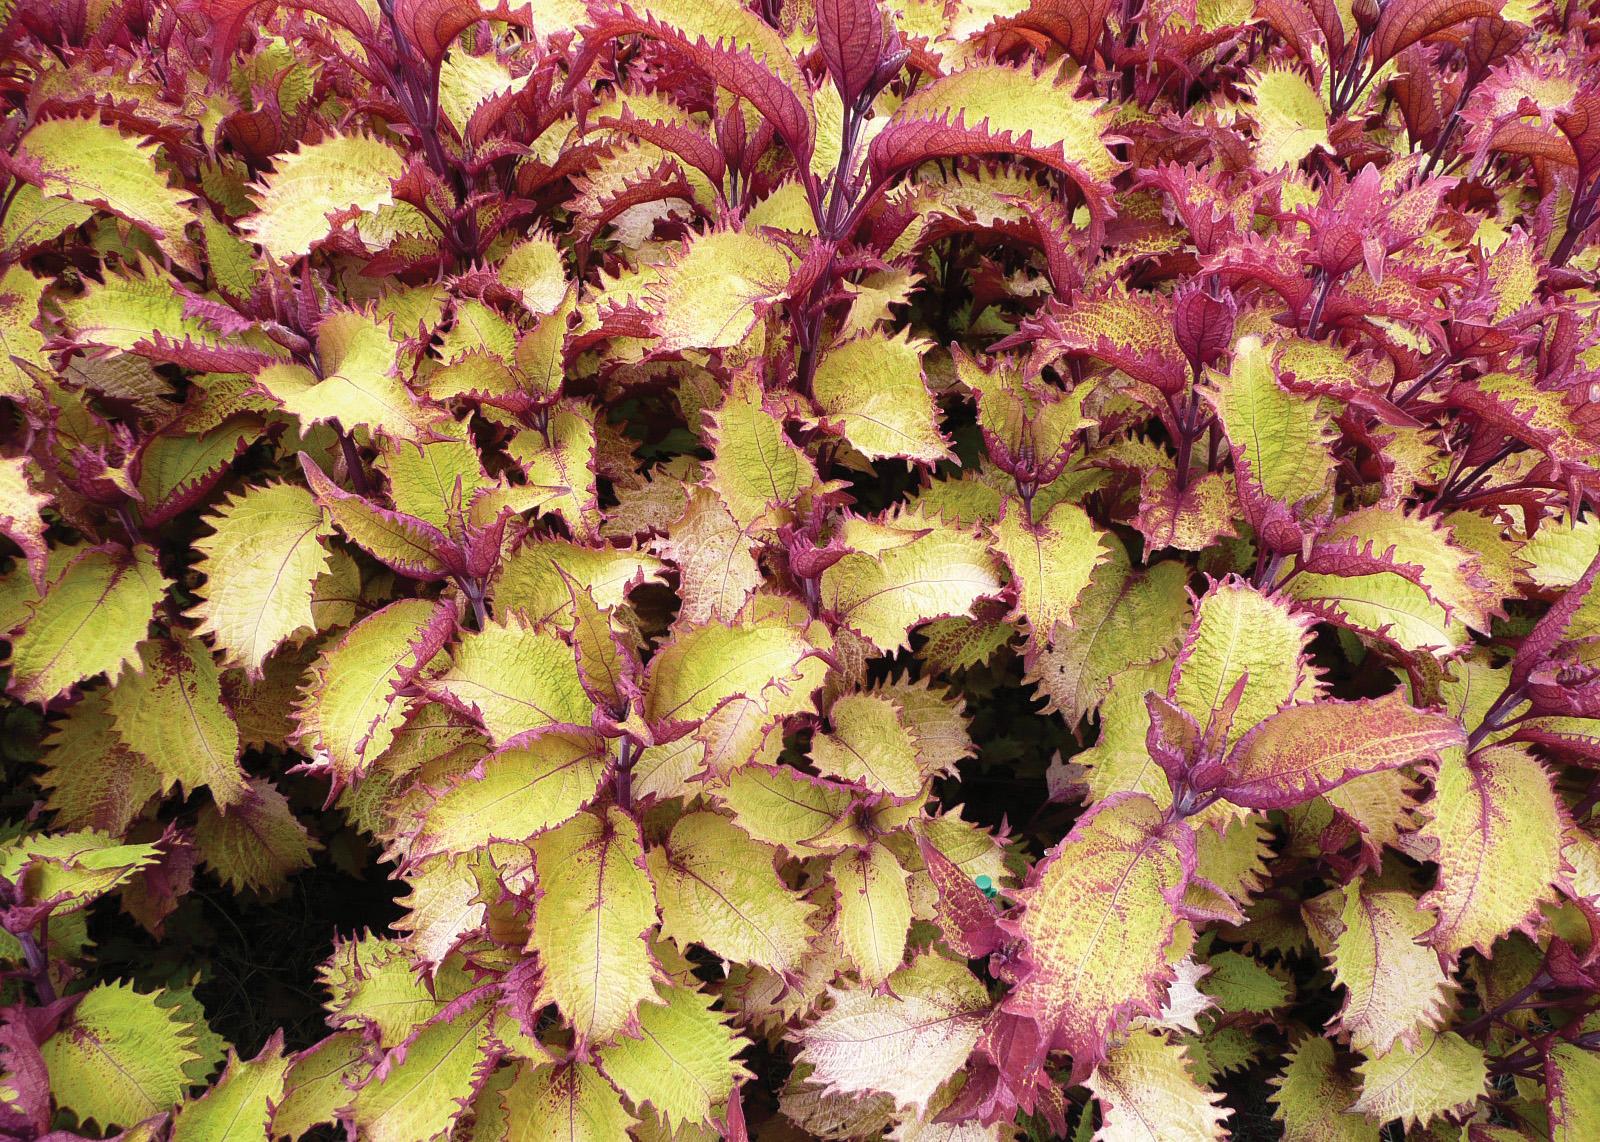 Louisiana Super Plants Warm Season Flowers